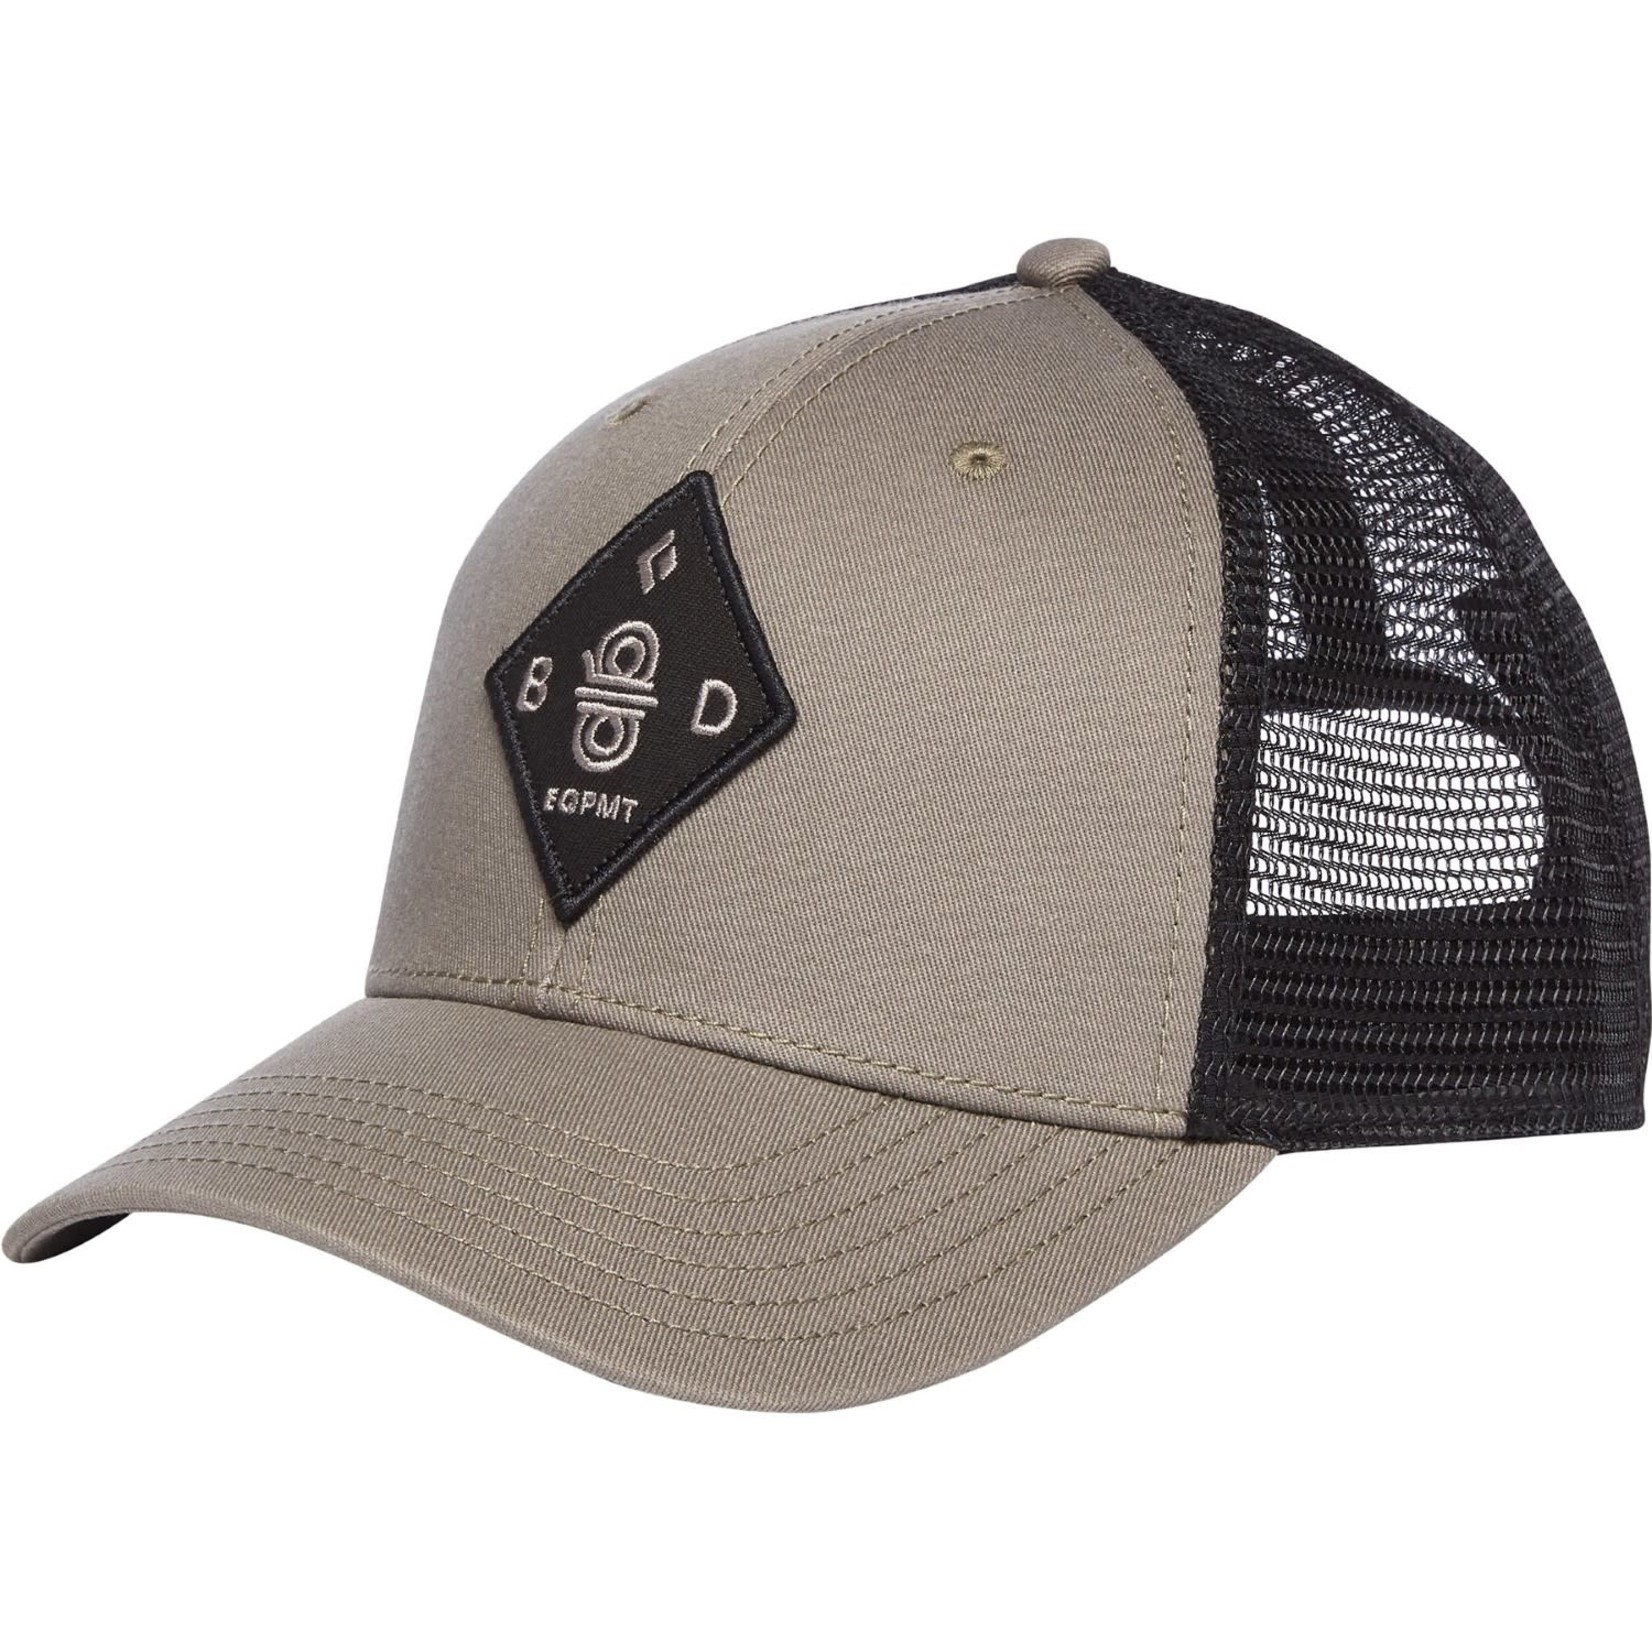 Black Diamond Black Diamond Trucker Hat - Men